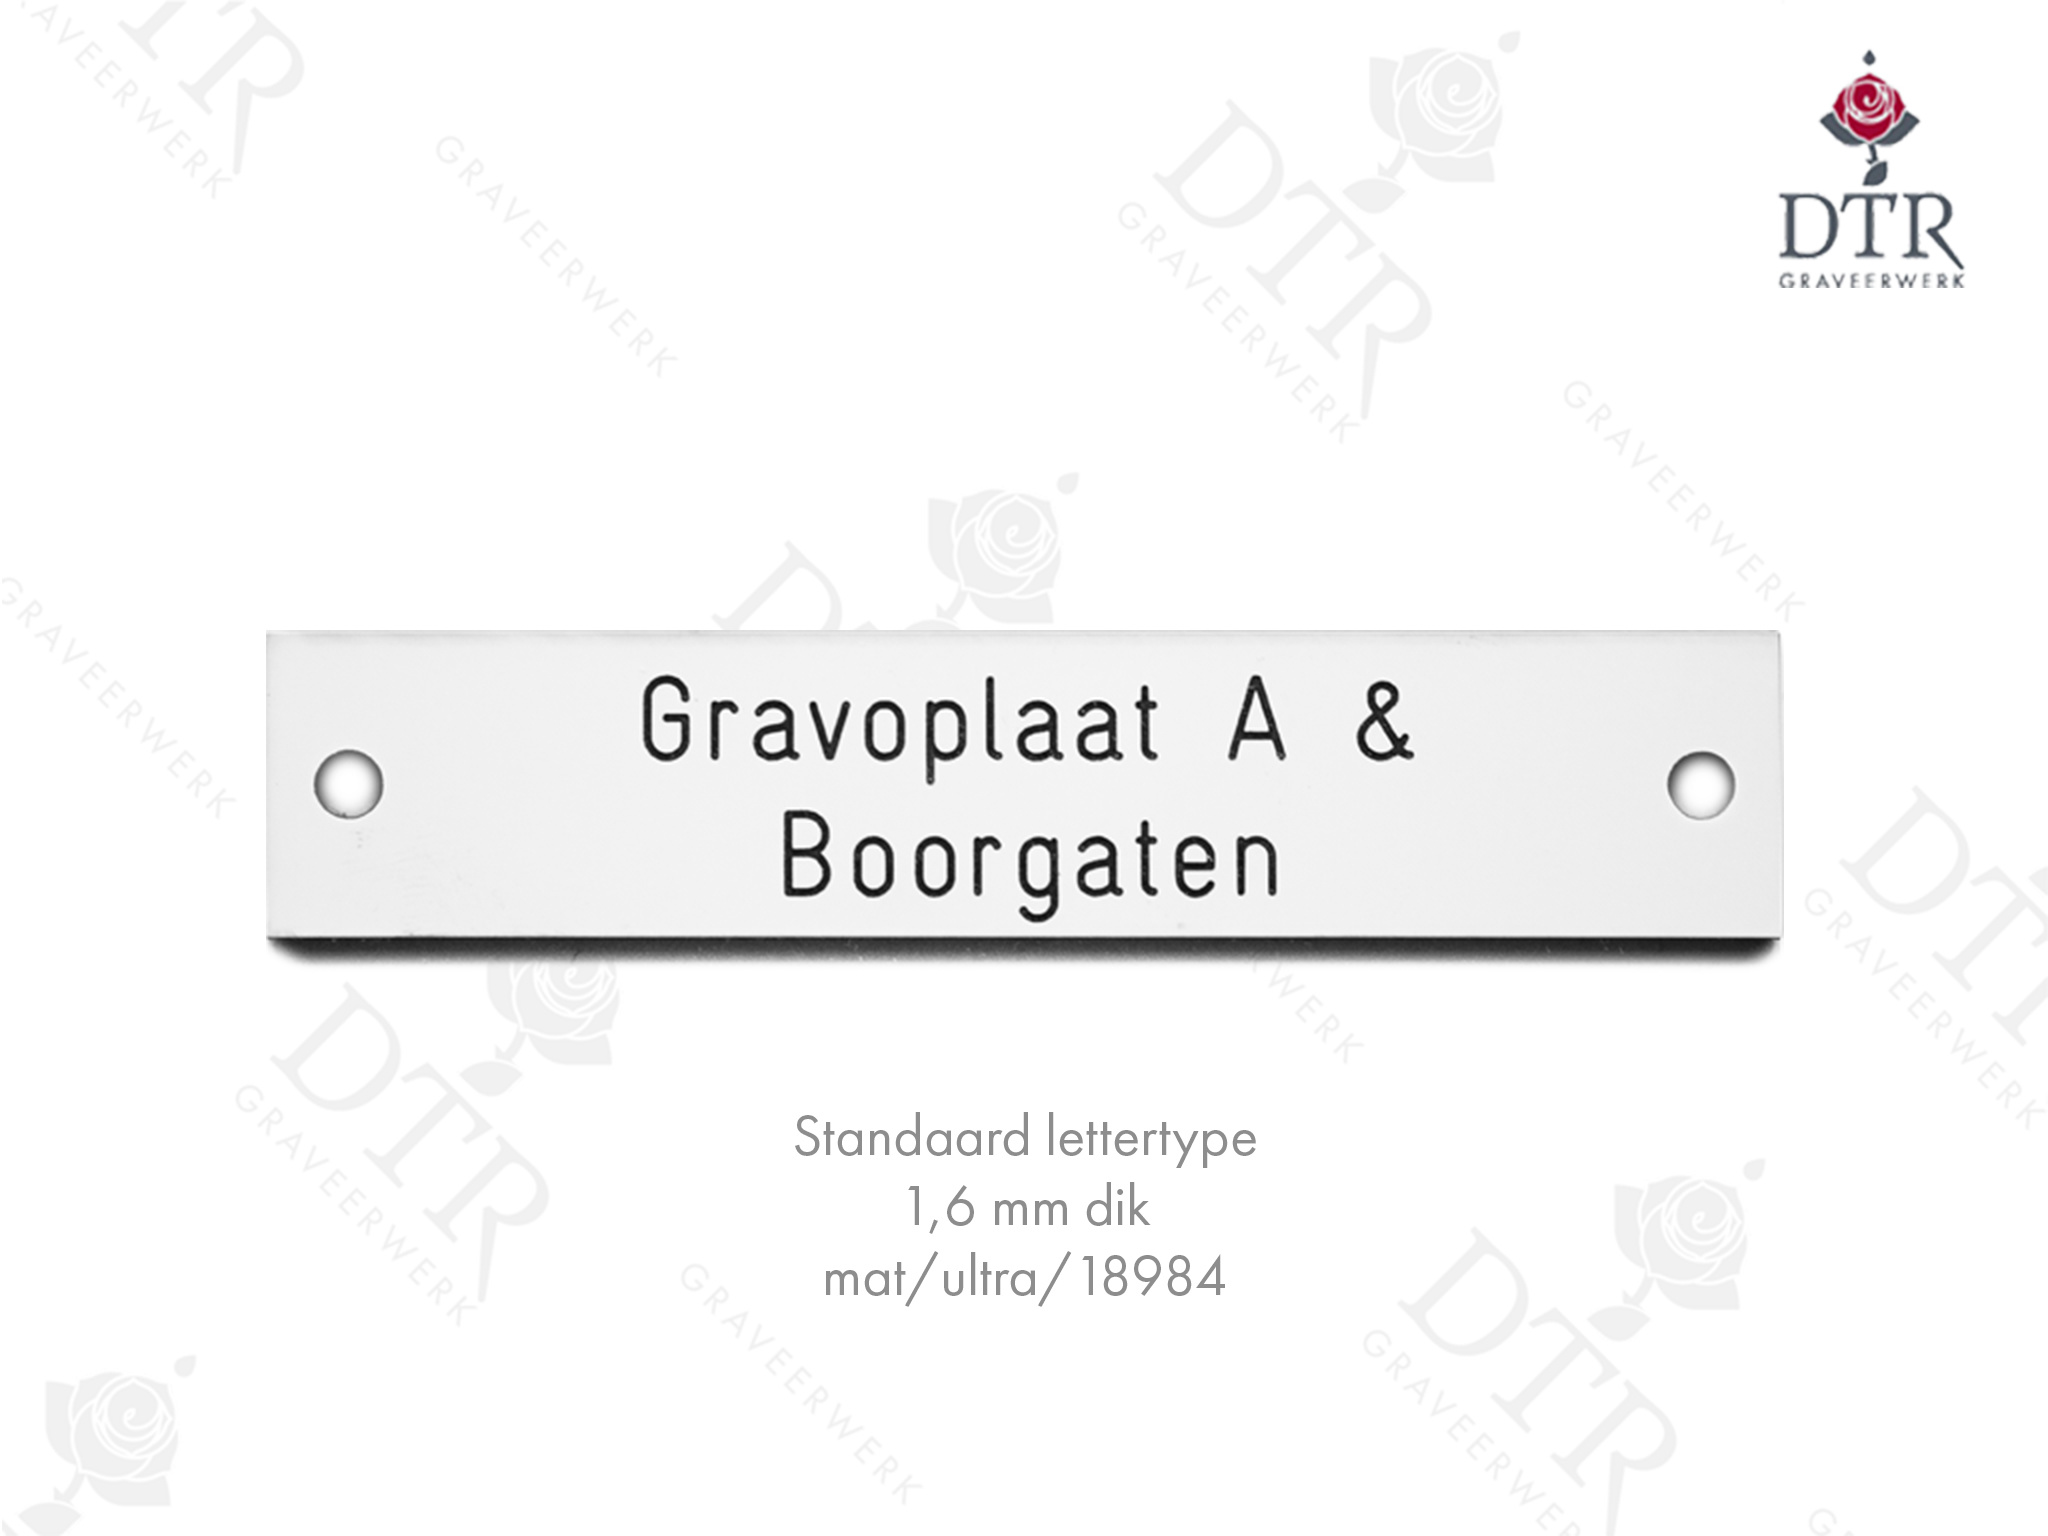 Beethovenlaan 412/458